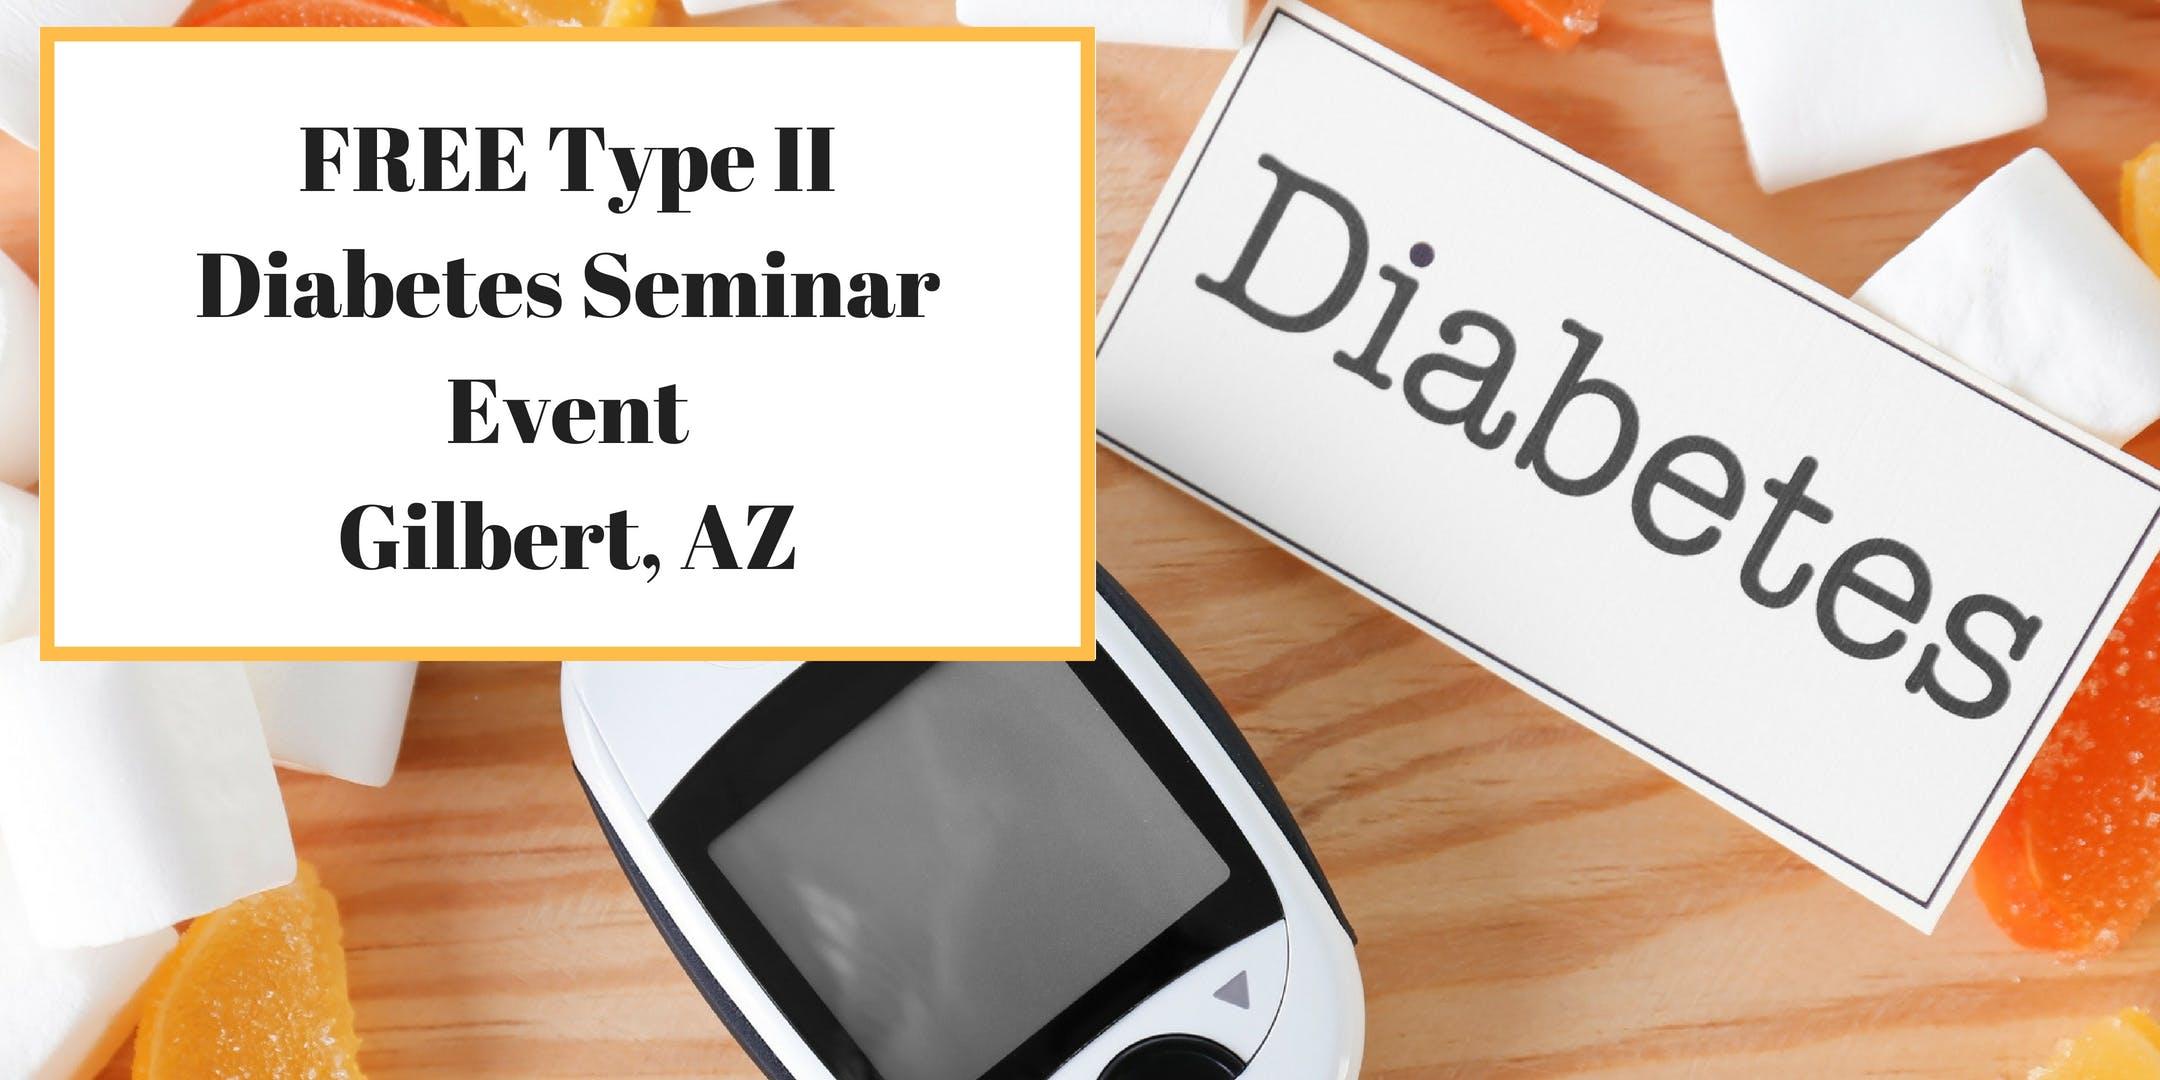 FREE Type II Diabetes Seminar Event -